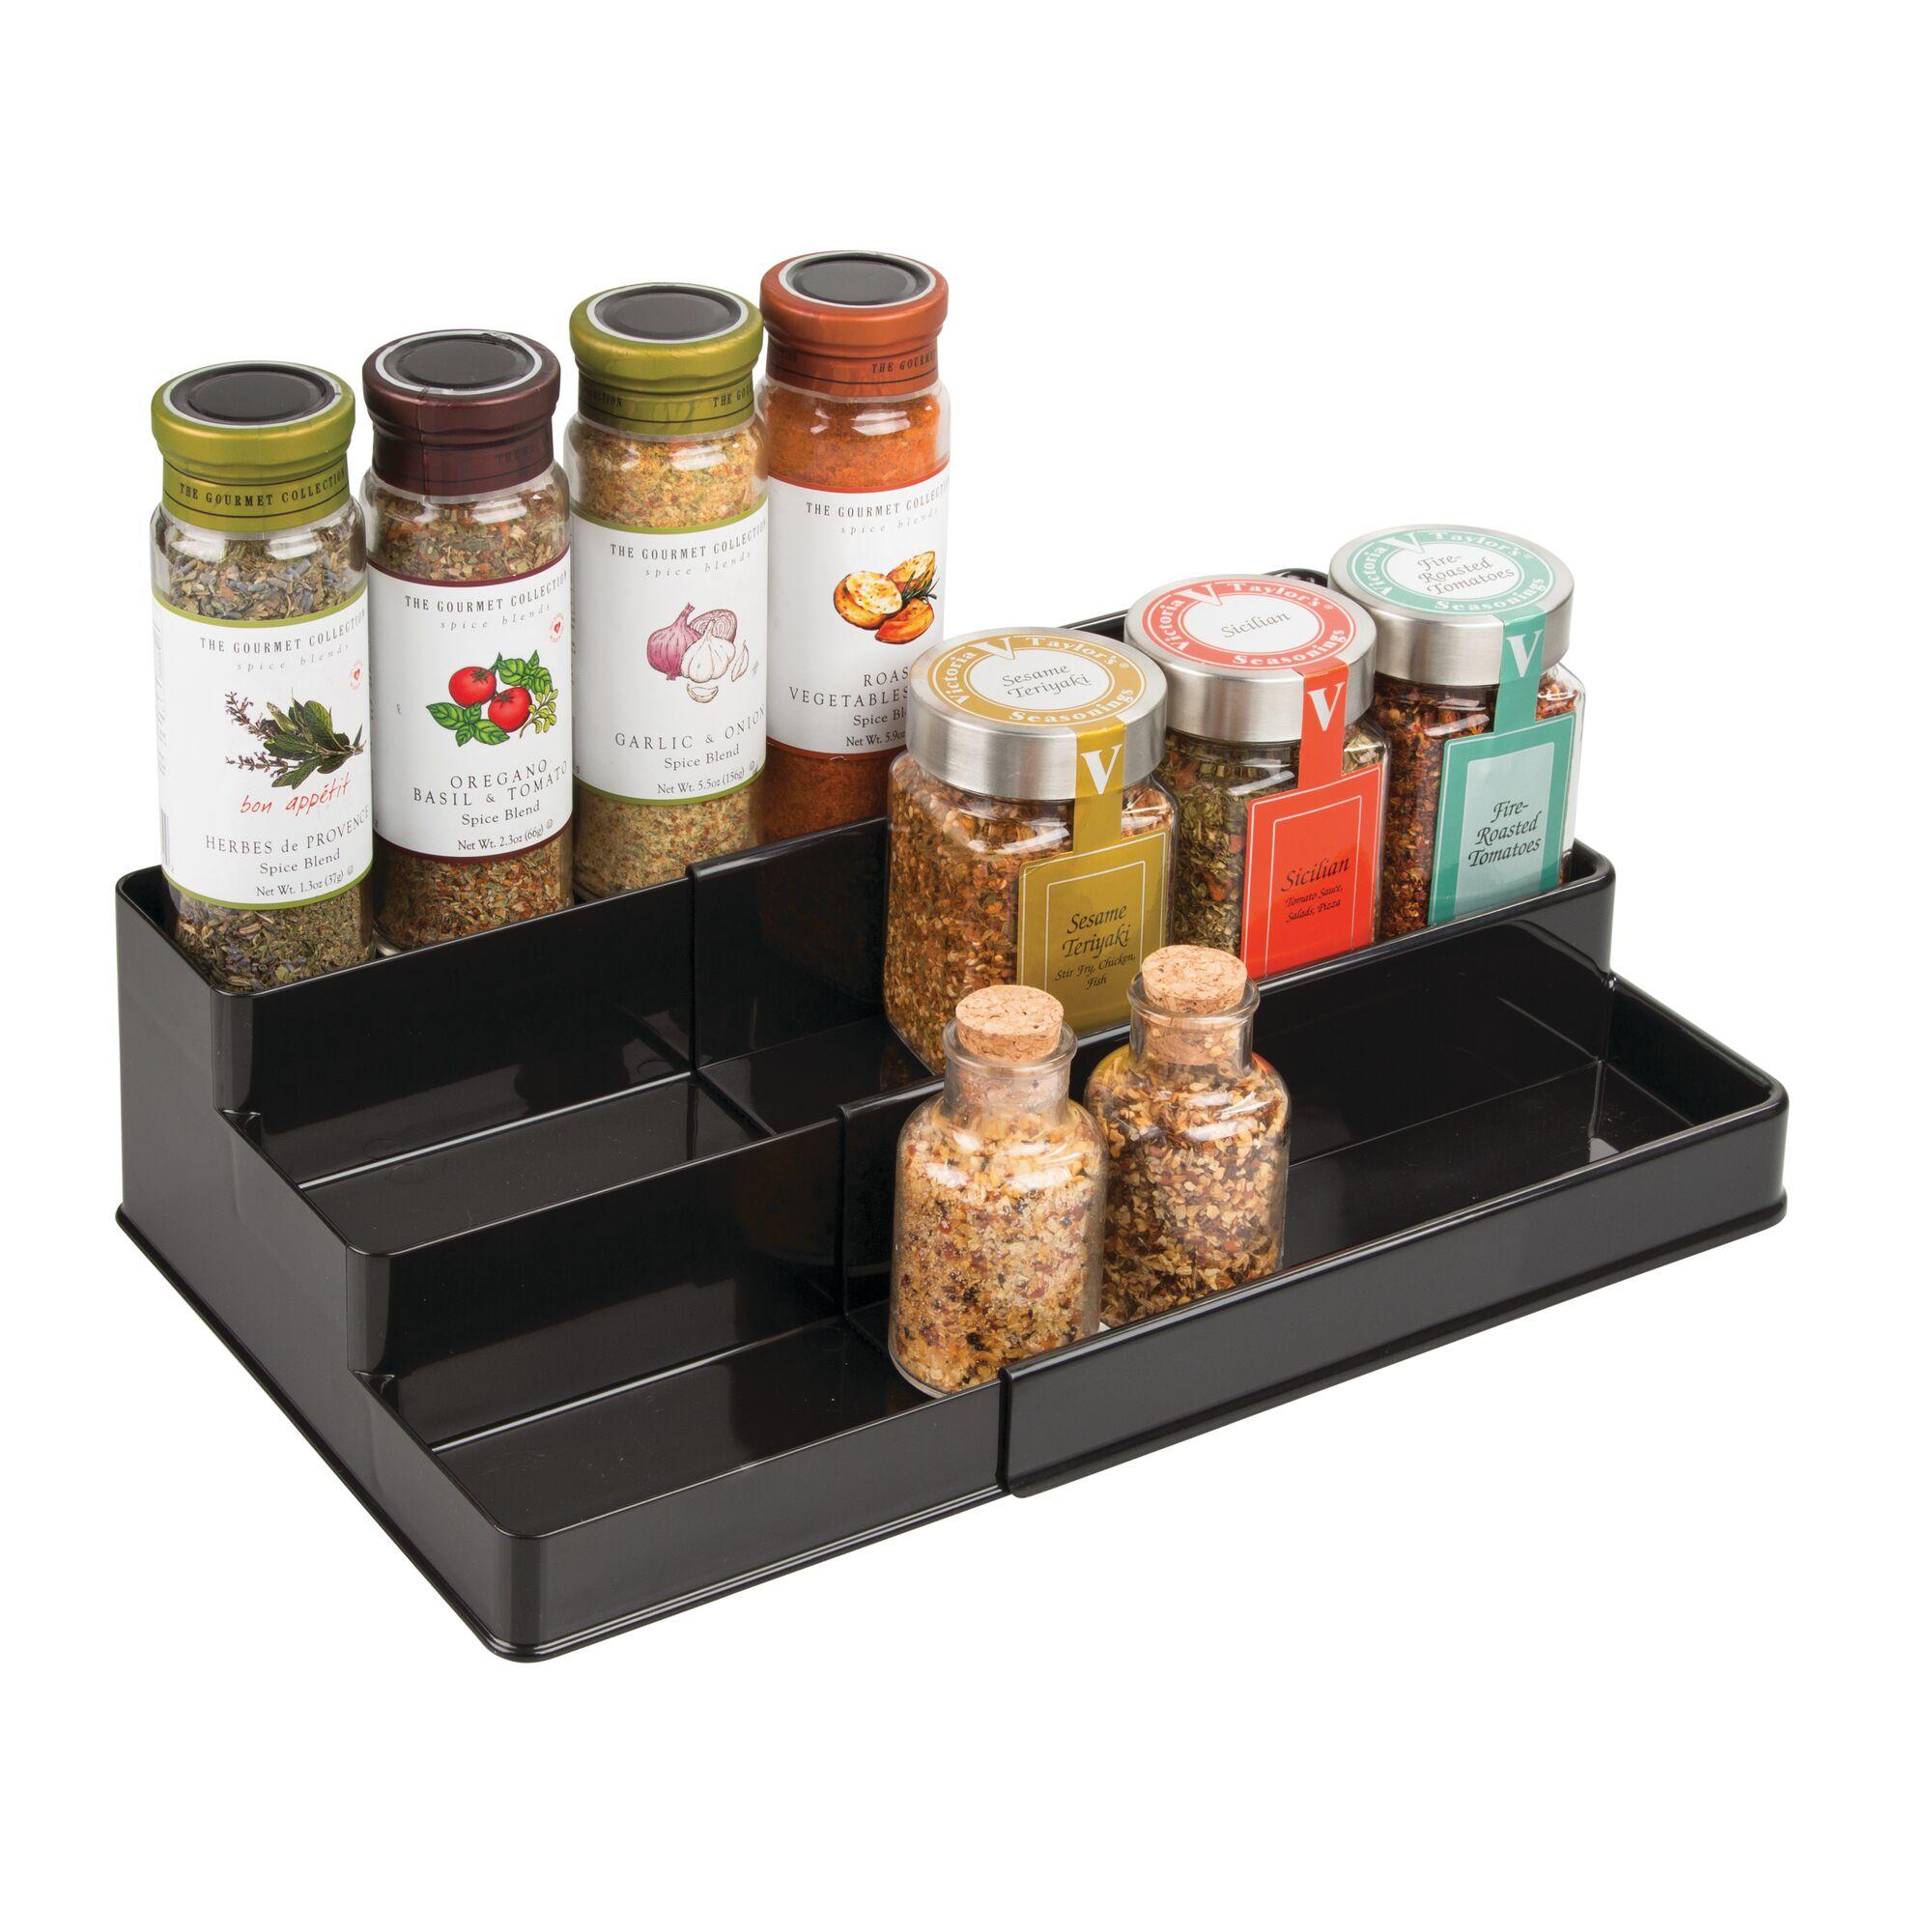 mDesign-Expandable-Kitchen-Cabinet-Pantry-Organizer-Spice-Rack thumbnail 7